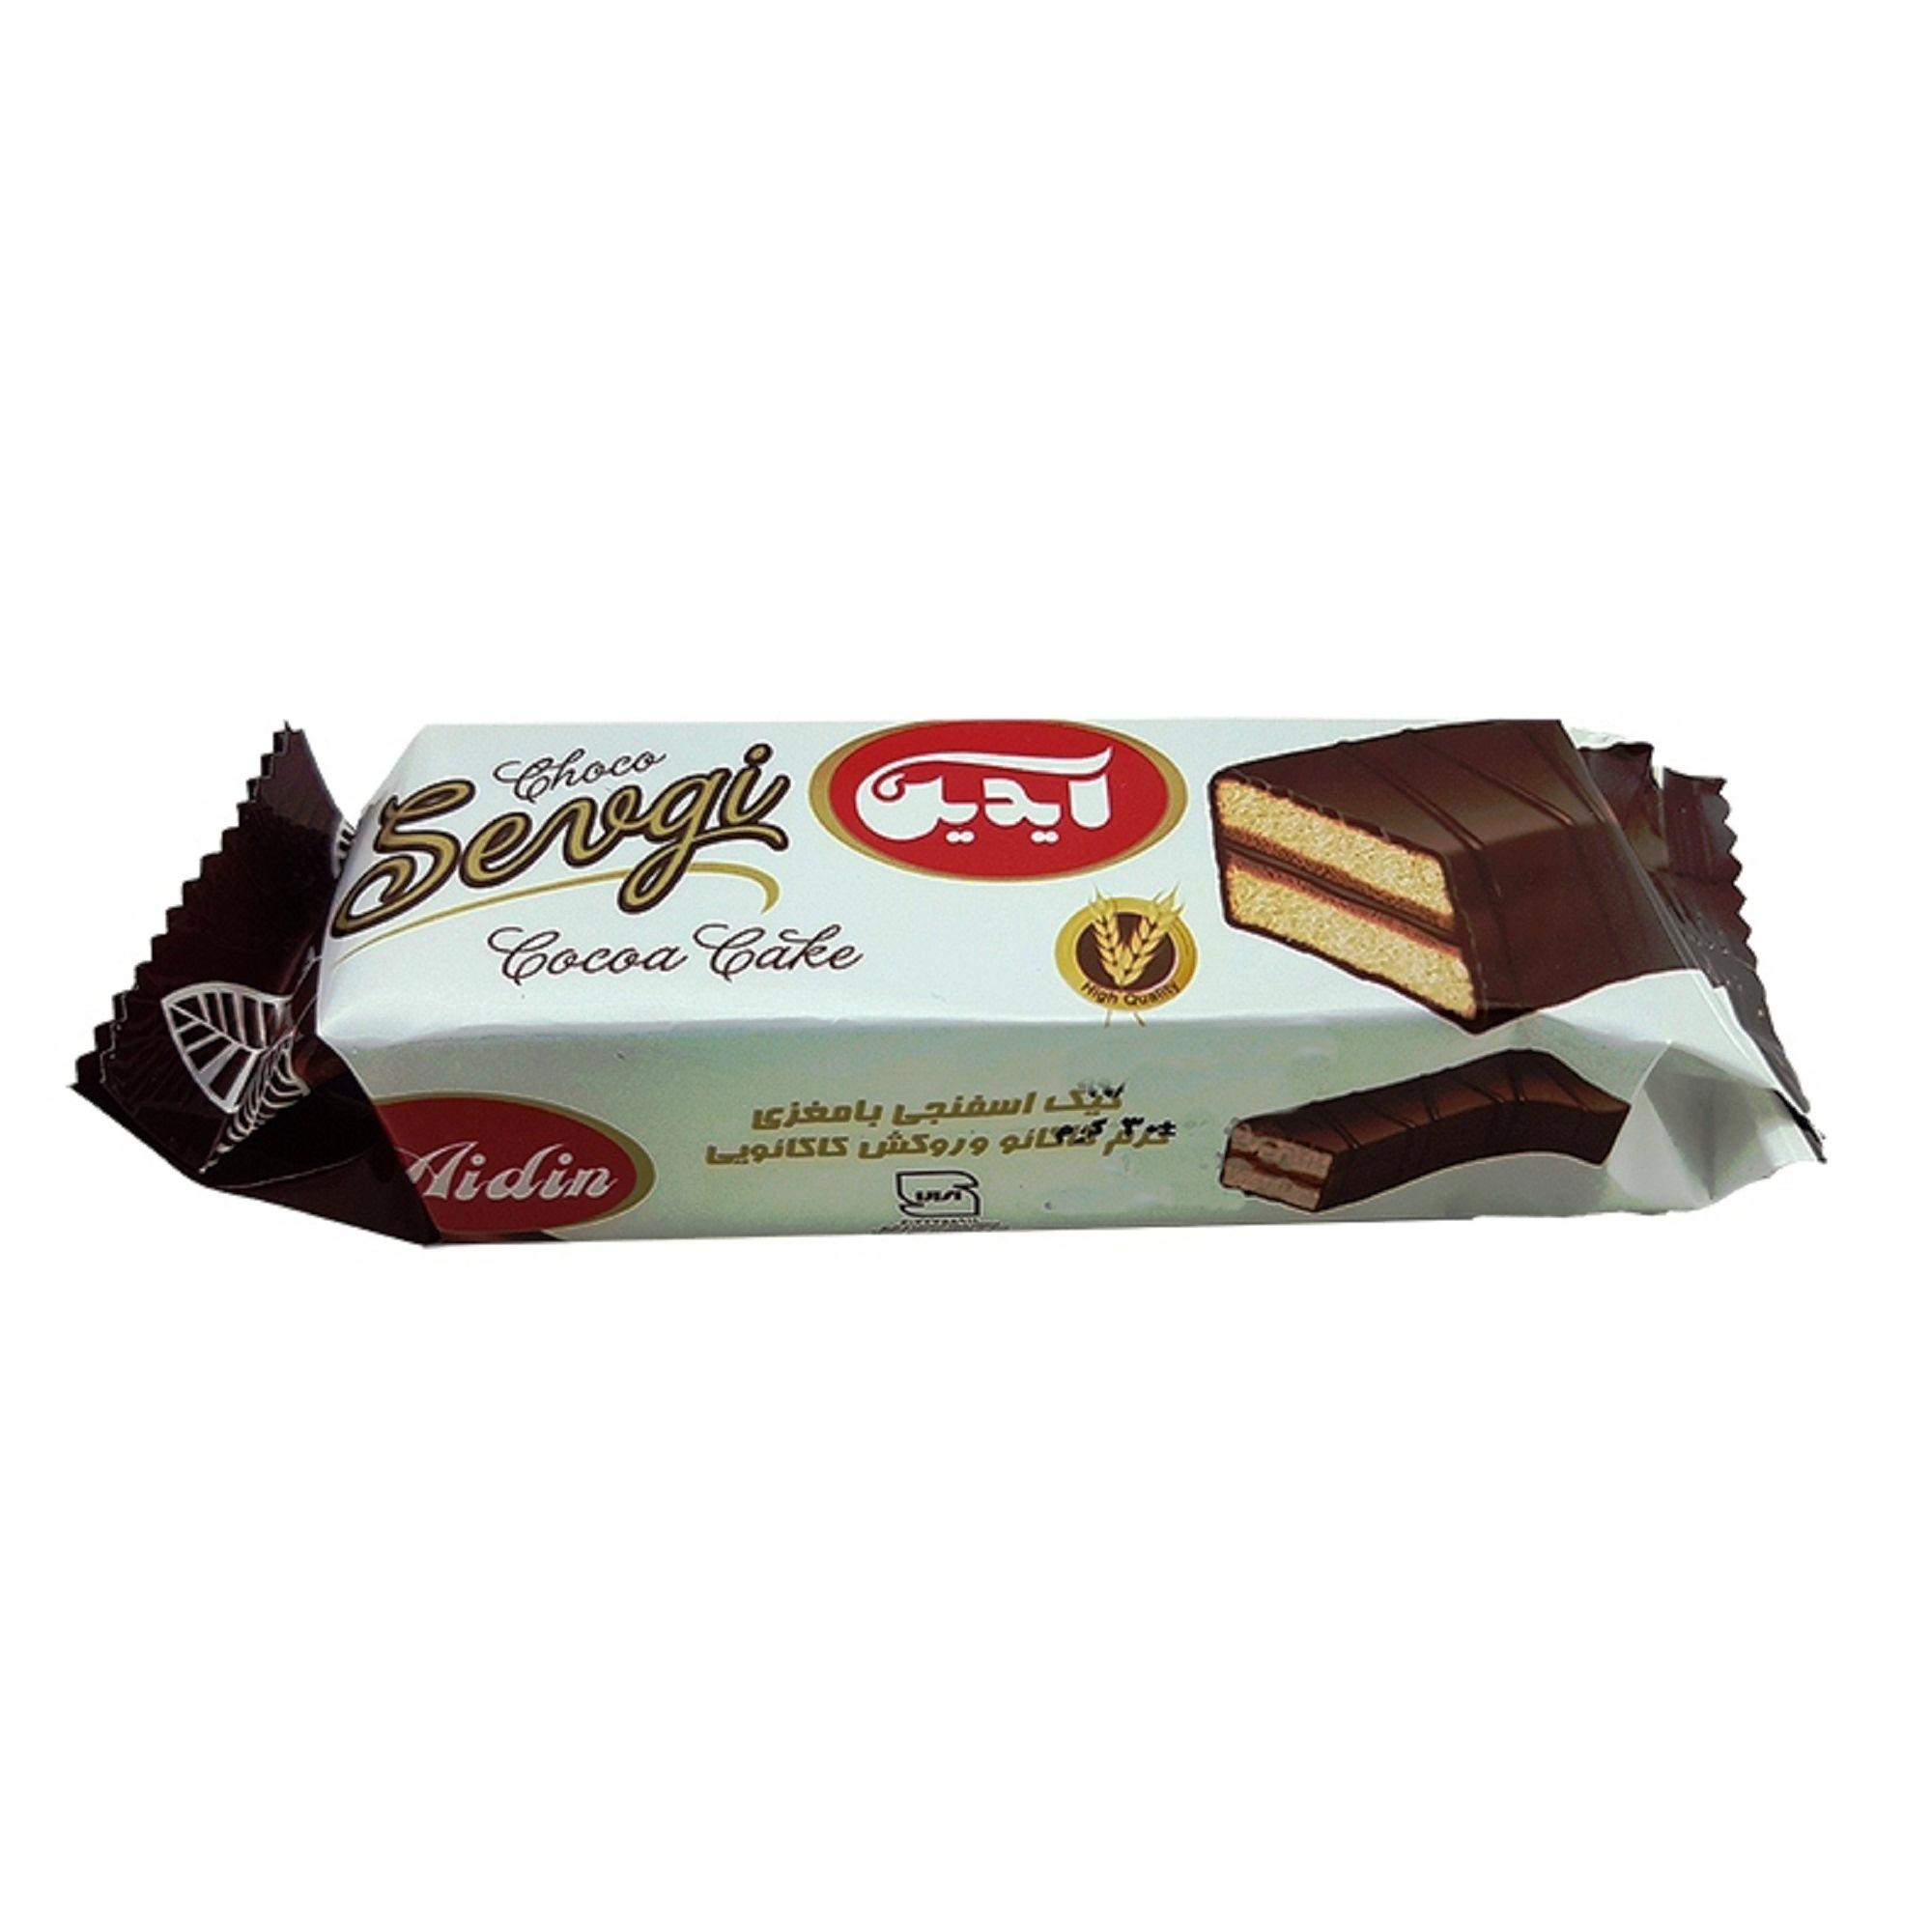 کیک اسفنجی با مغزی کرم کاکائو و روکش کاکائویی آیدین - 30 گرم بسته 12 عددی  main 1 5